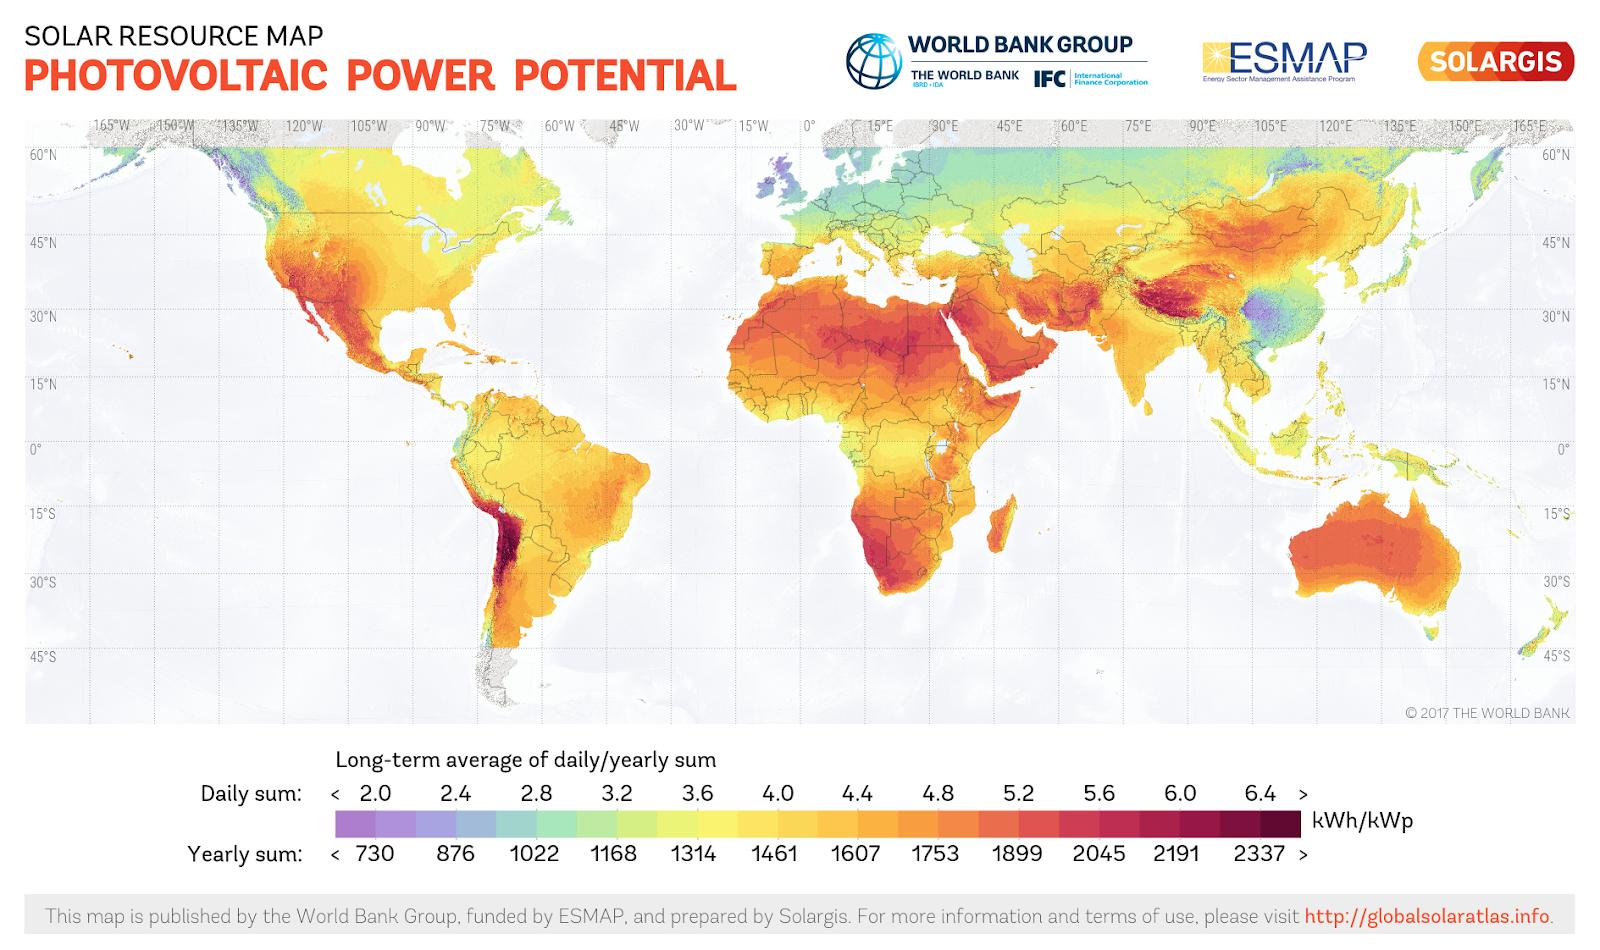 Source:  World Bank Group, ESMMAP, Solargis